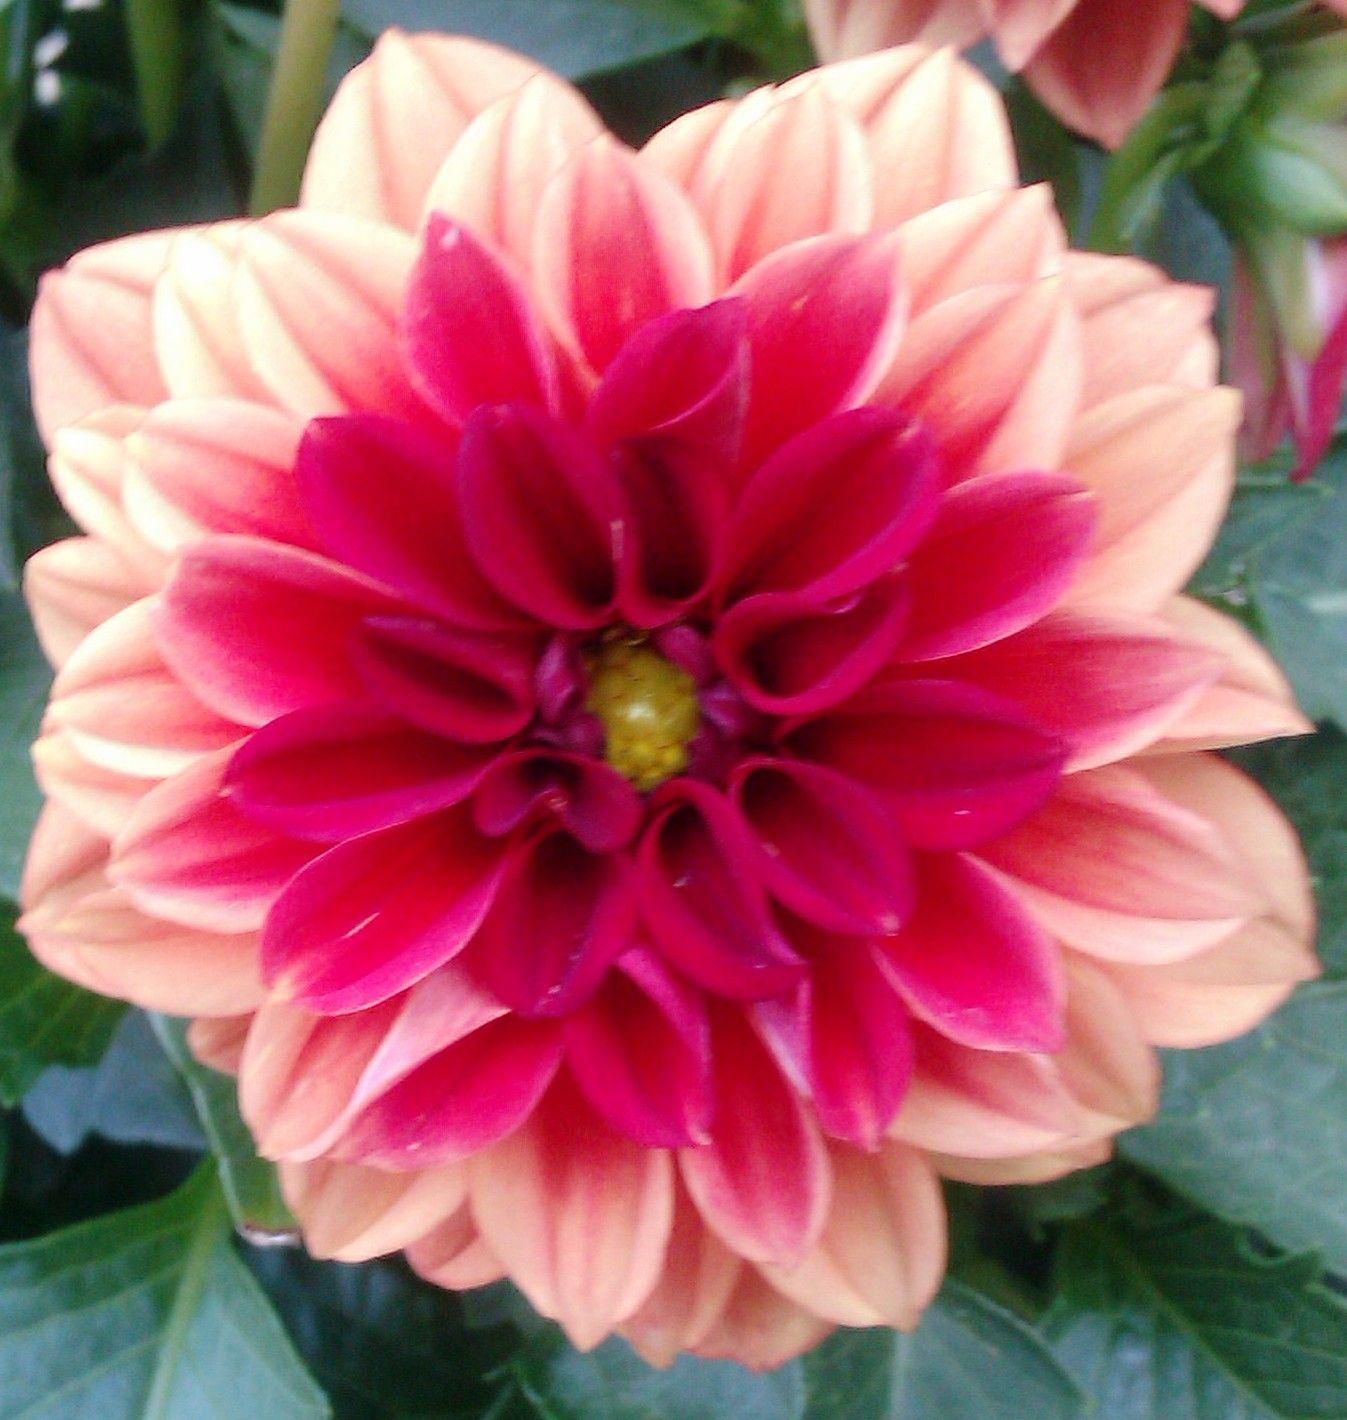 Pin By Evonne Lorini On Just A Little Peek At Nature Dahlia Flower Beautiful Flowers Flower Farm